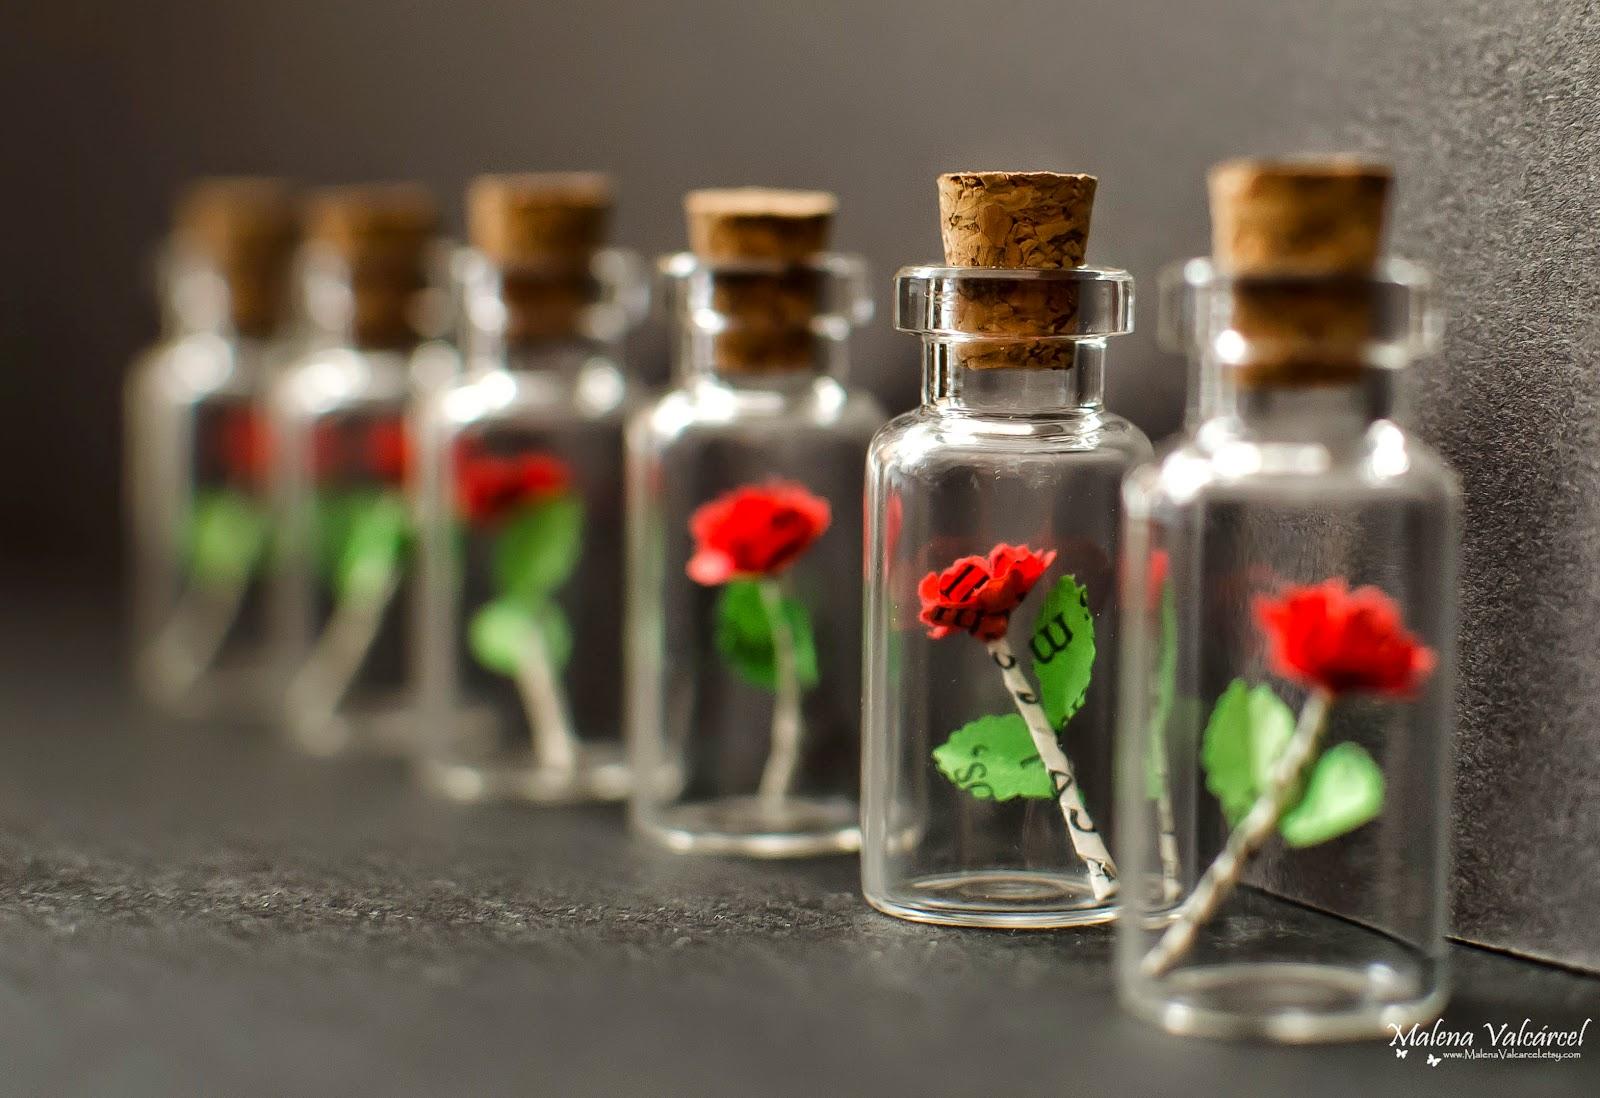 paper-rose-in-vial